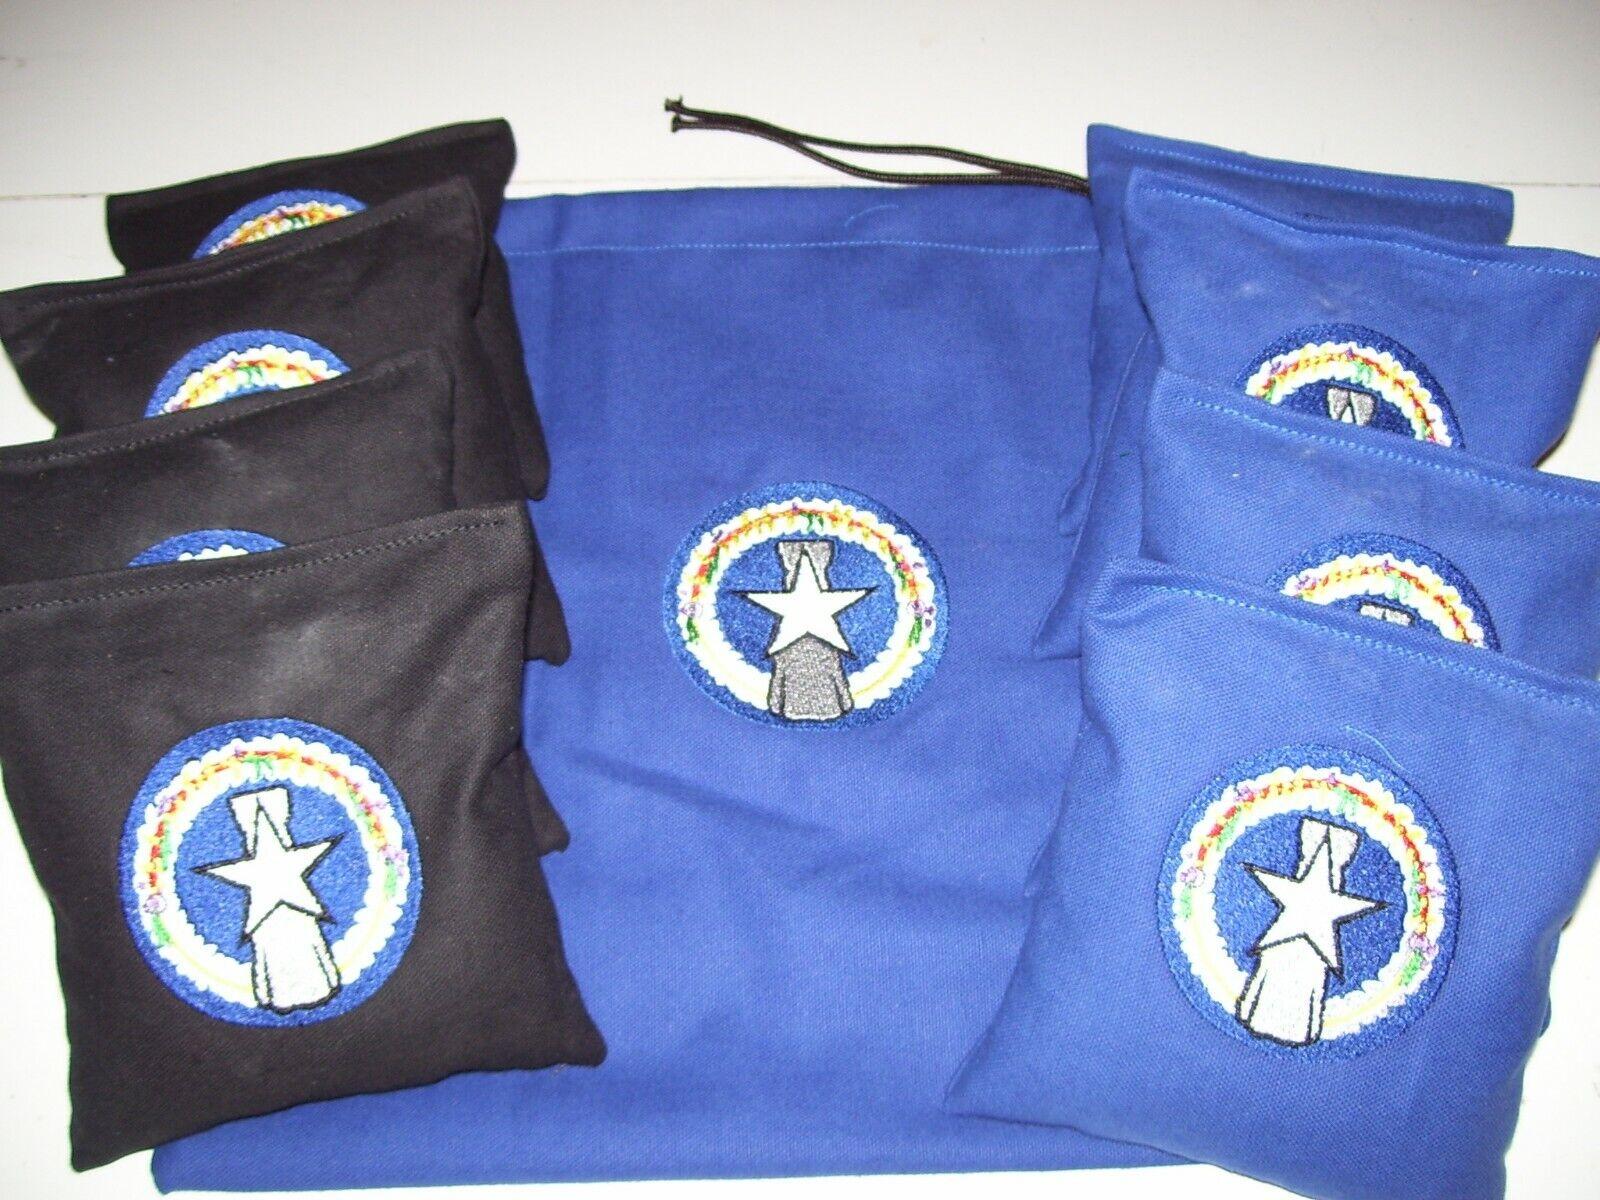 Saipan Embroidered  Cornhole Corn Hole Bags Set of 8 w  Storage Bag  up to 60% discount